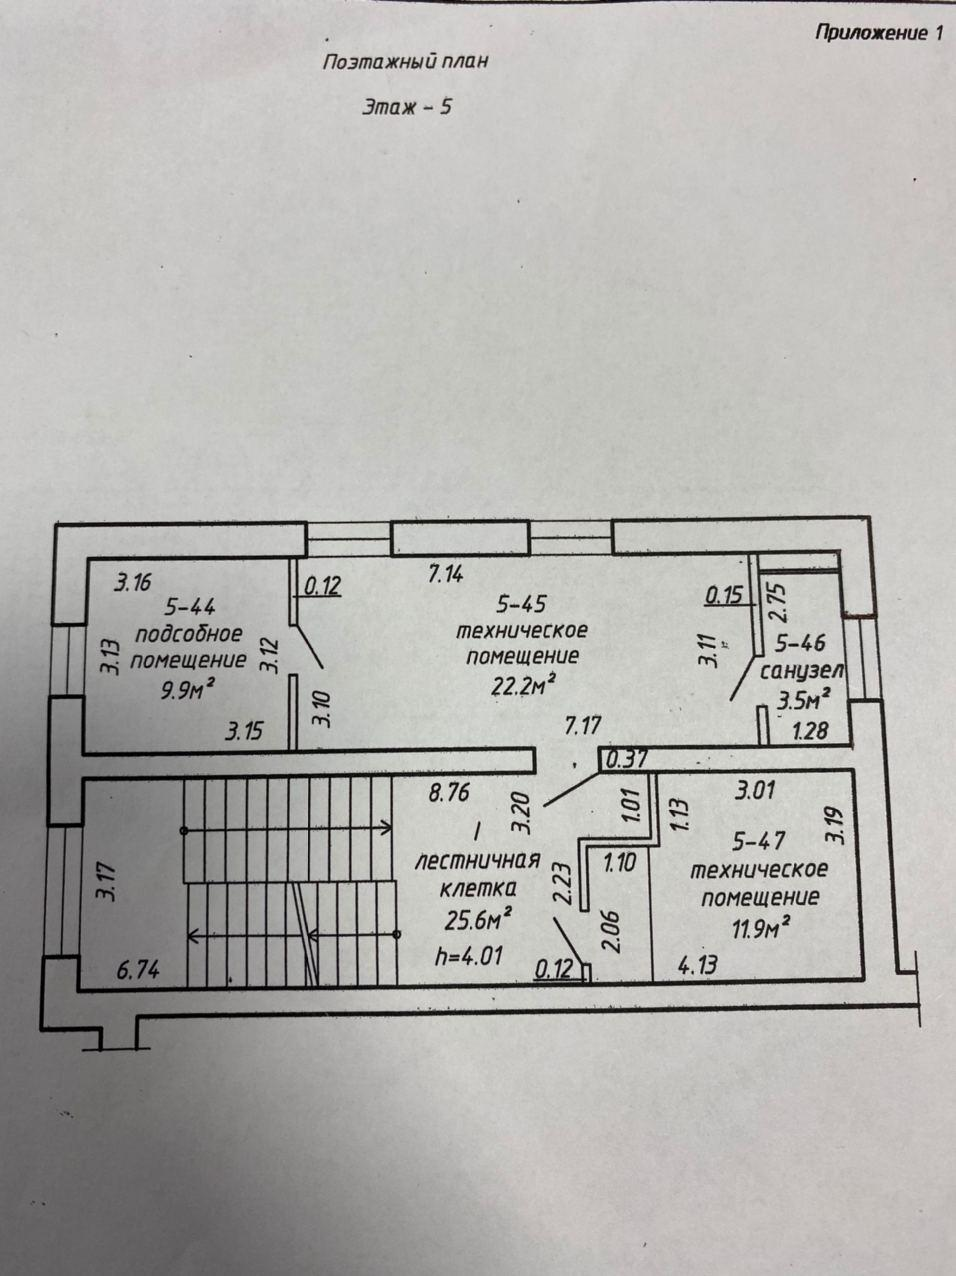 3 комнаты, сан. узел, 35,6 кв.м.